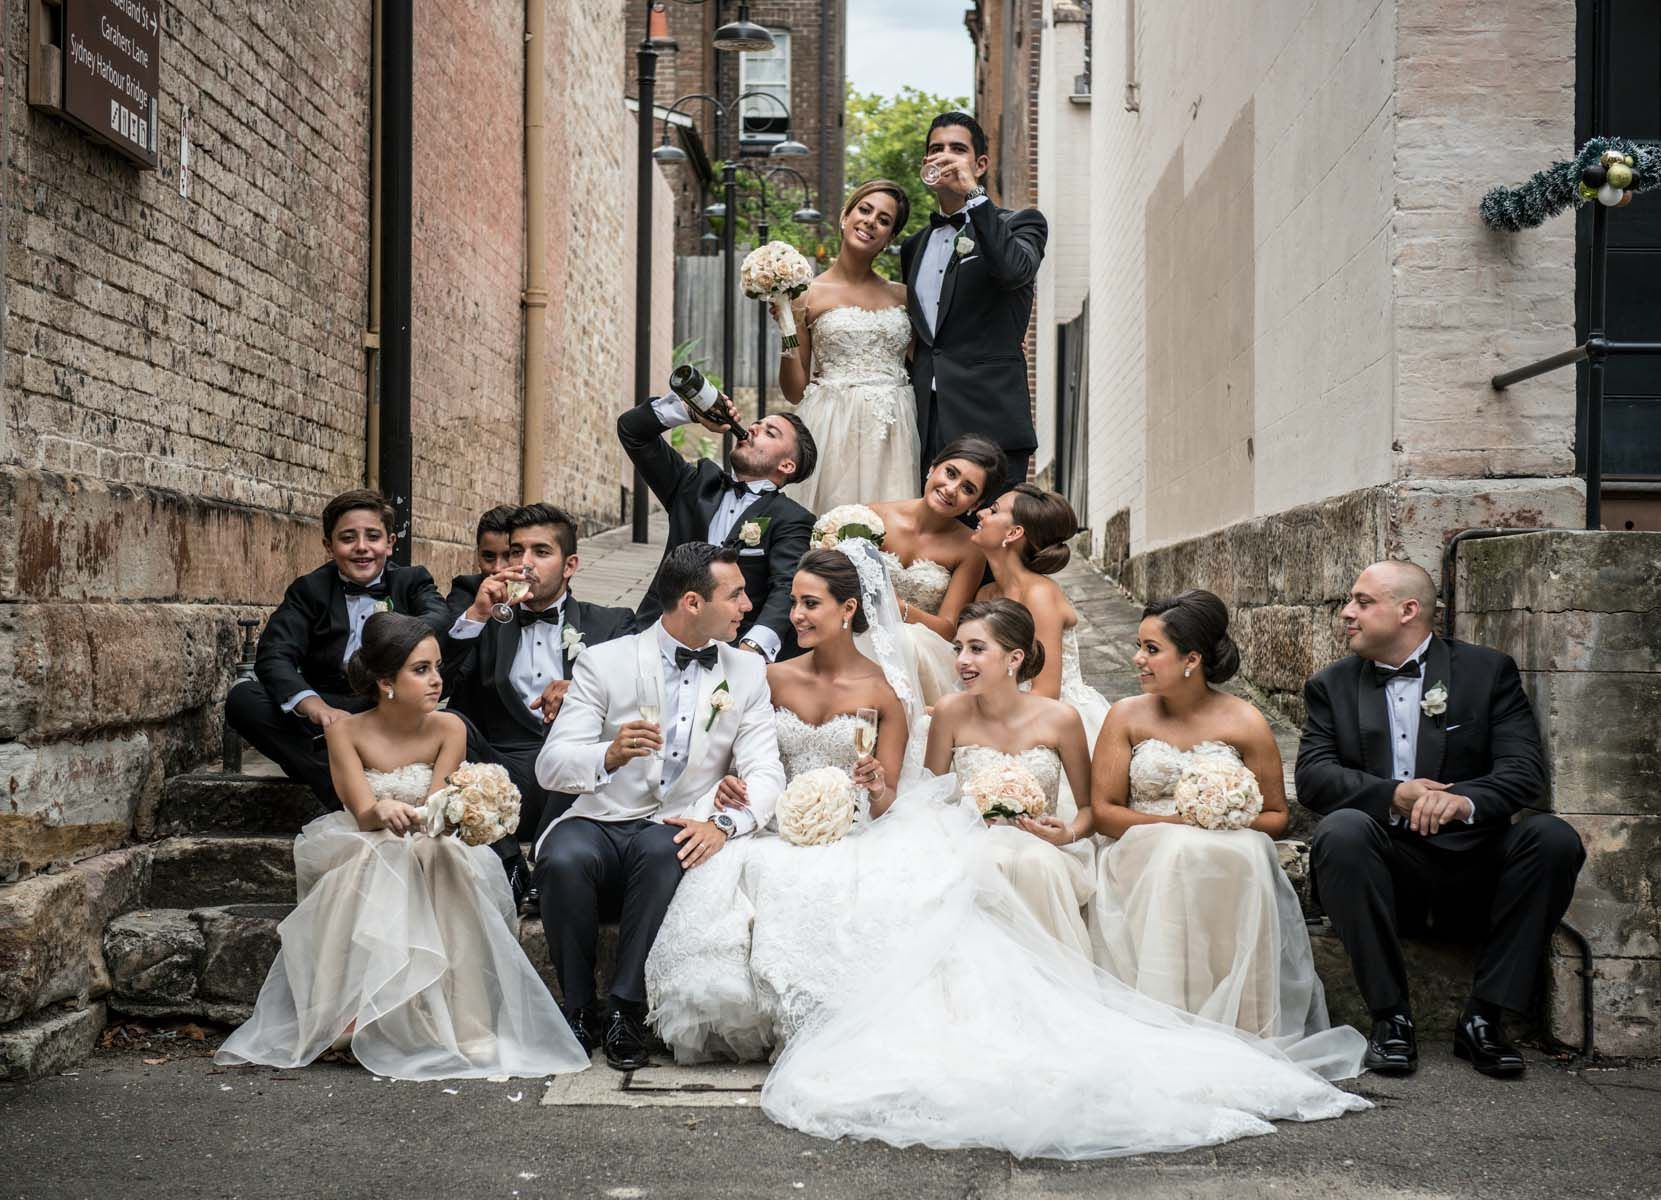 Real wedding jaimee and elias wedded wonderland dream wedding